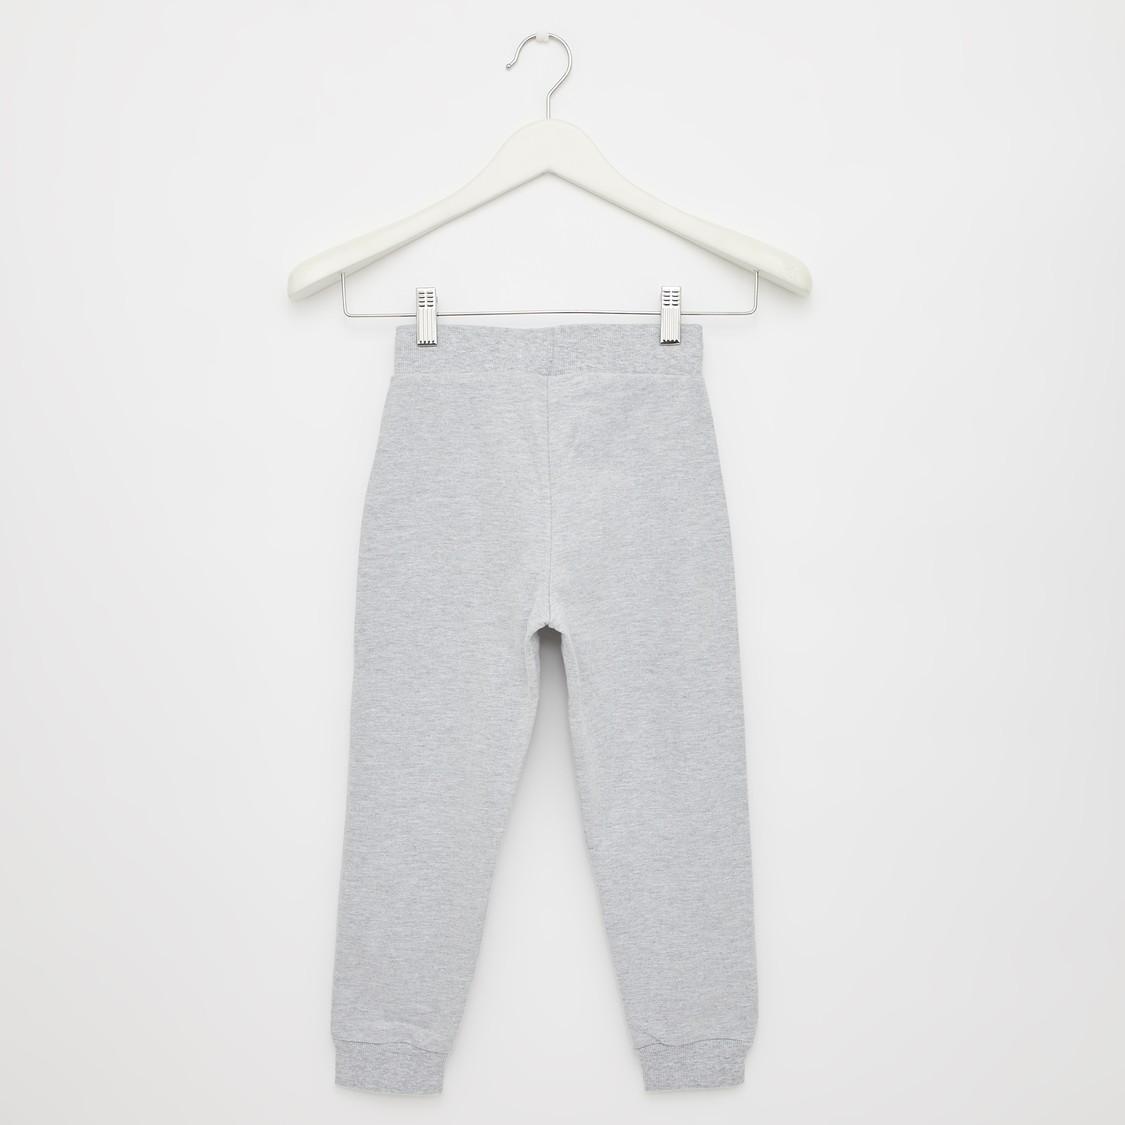 Daisy Duck Print Round Neck Sweatshirt and Jog Pants Set